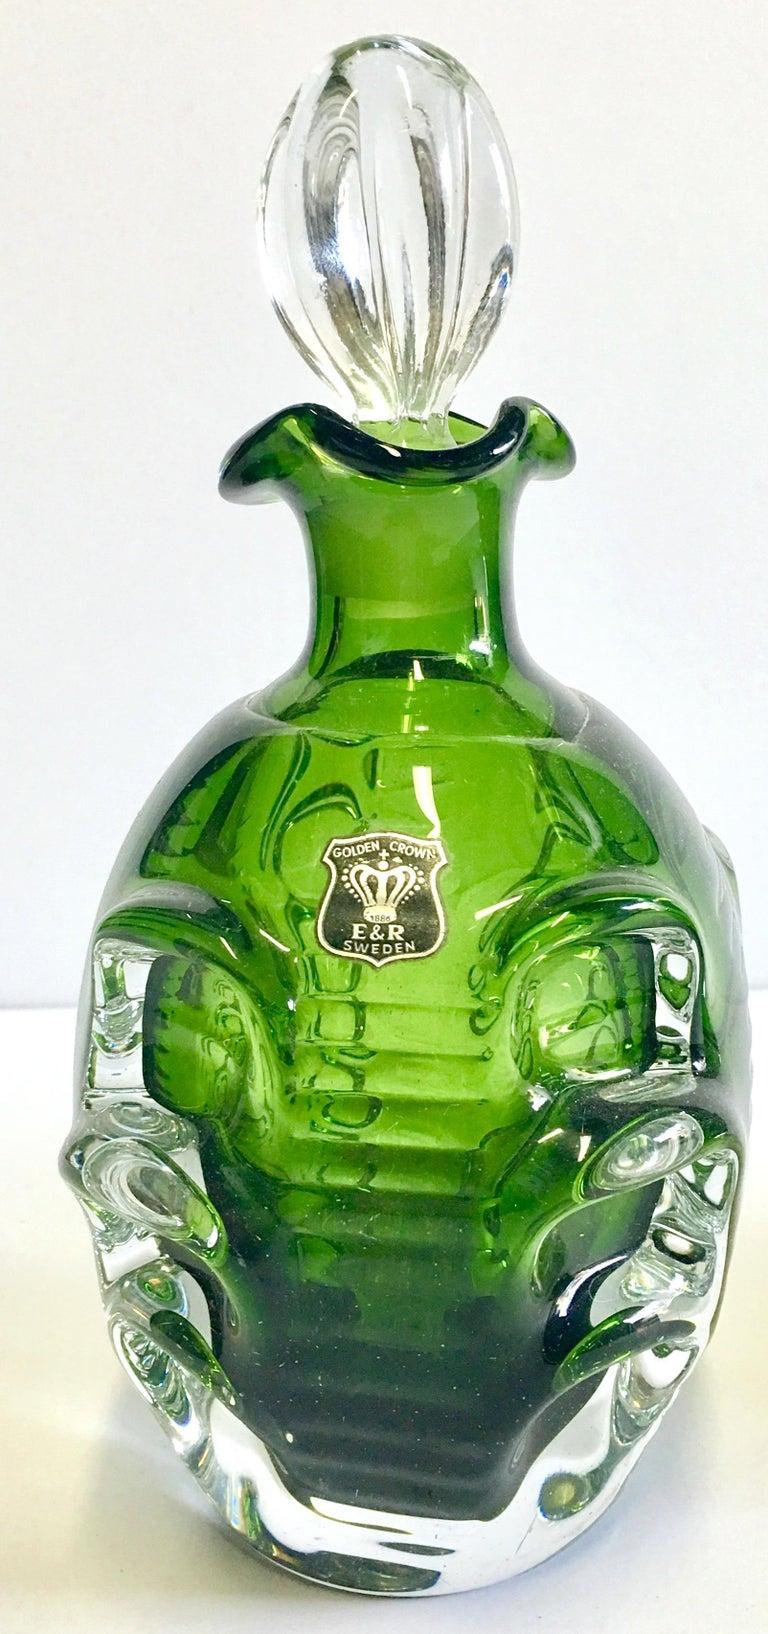 Mid-20th Century Pair of Crystal Swedish Liquor Decanters by Bo Borgstrom-Aseda For Sale 2